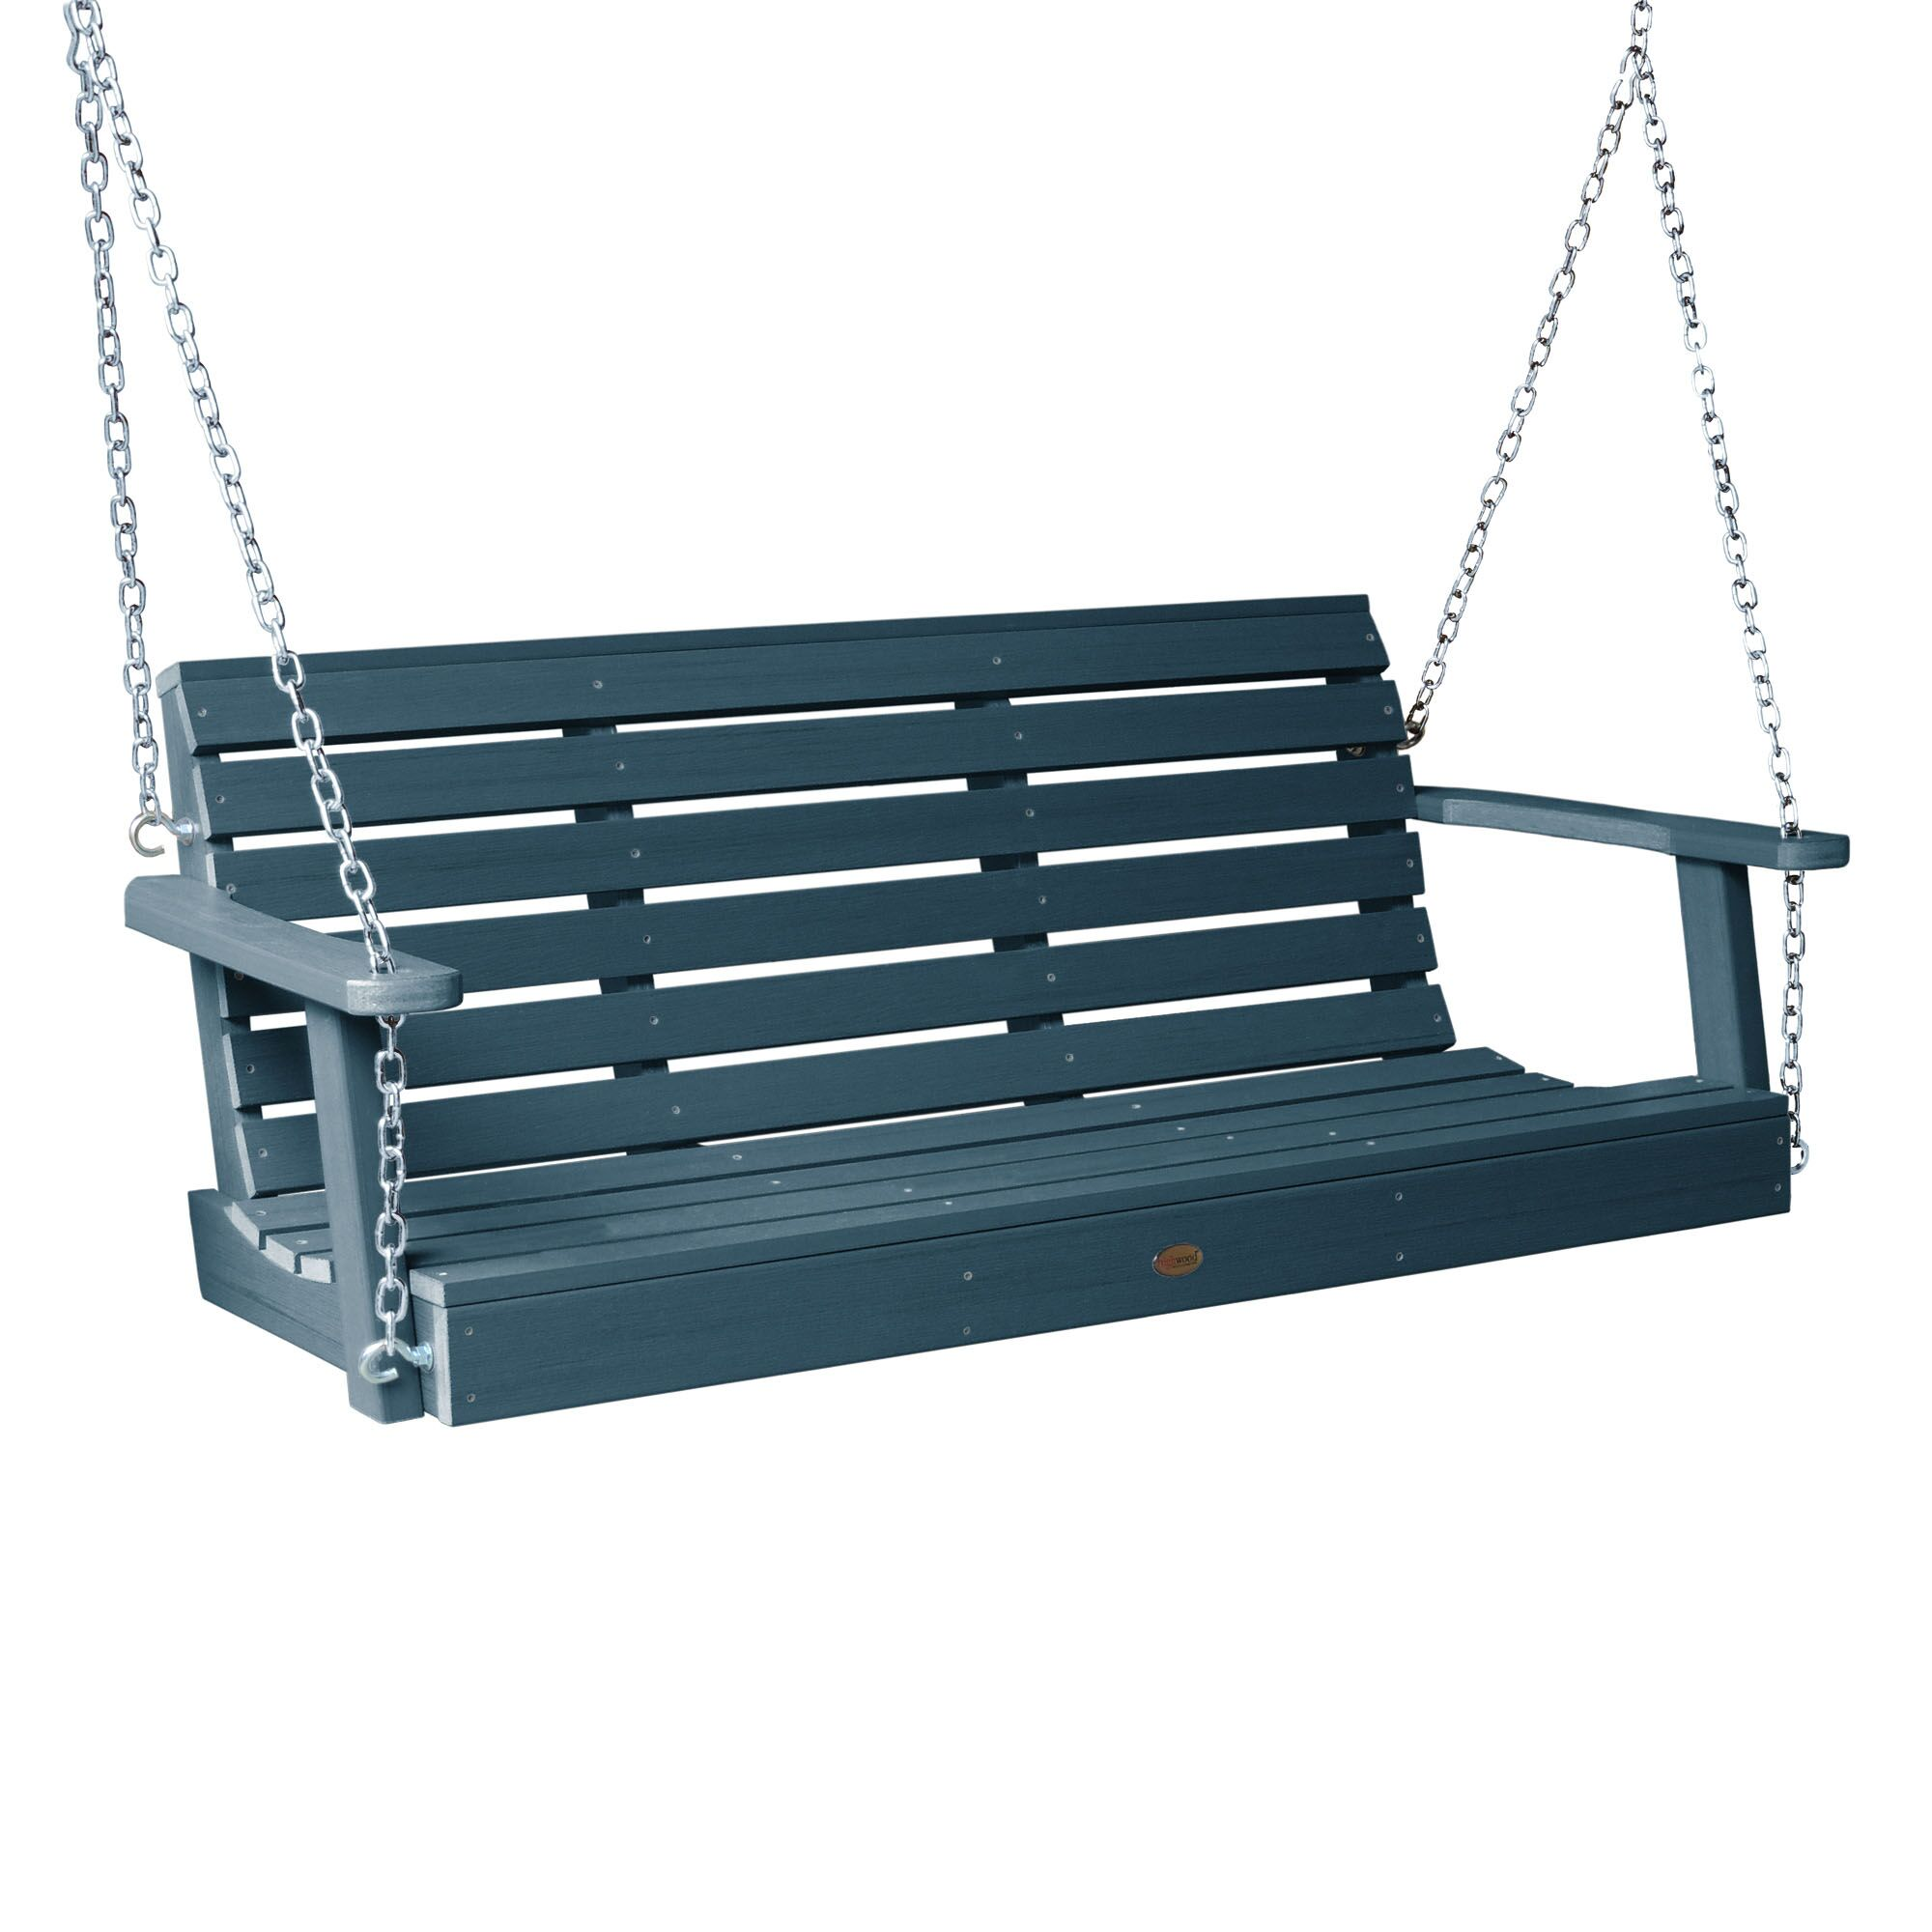 Shondra Porch Swing Size: 22